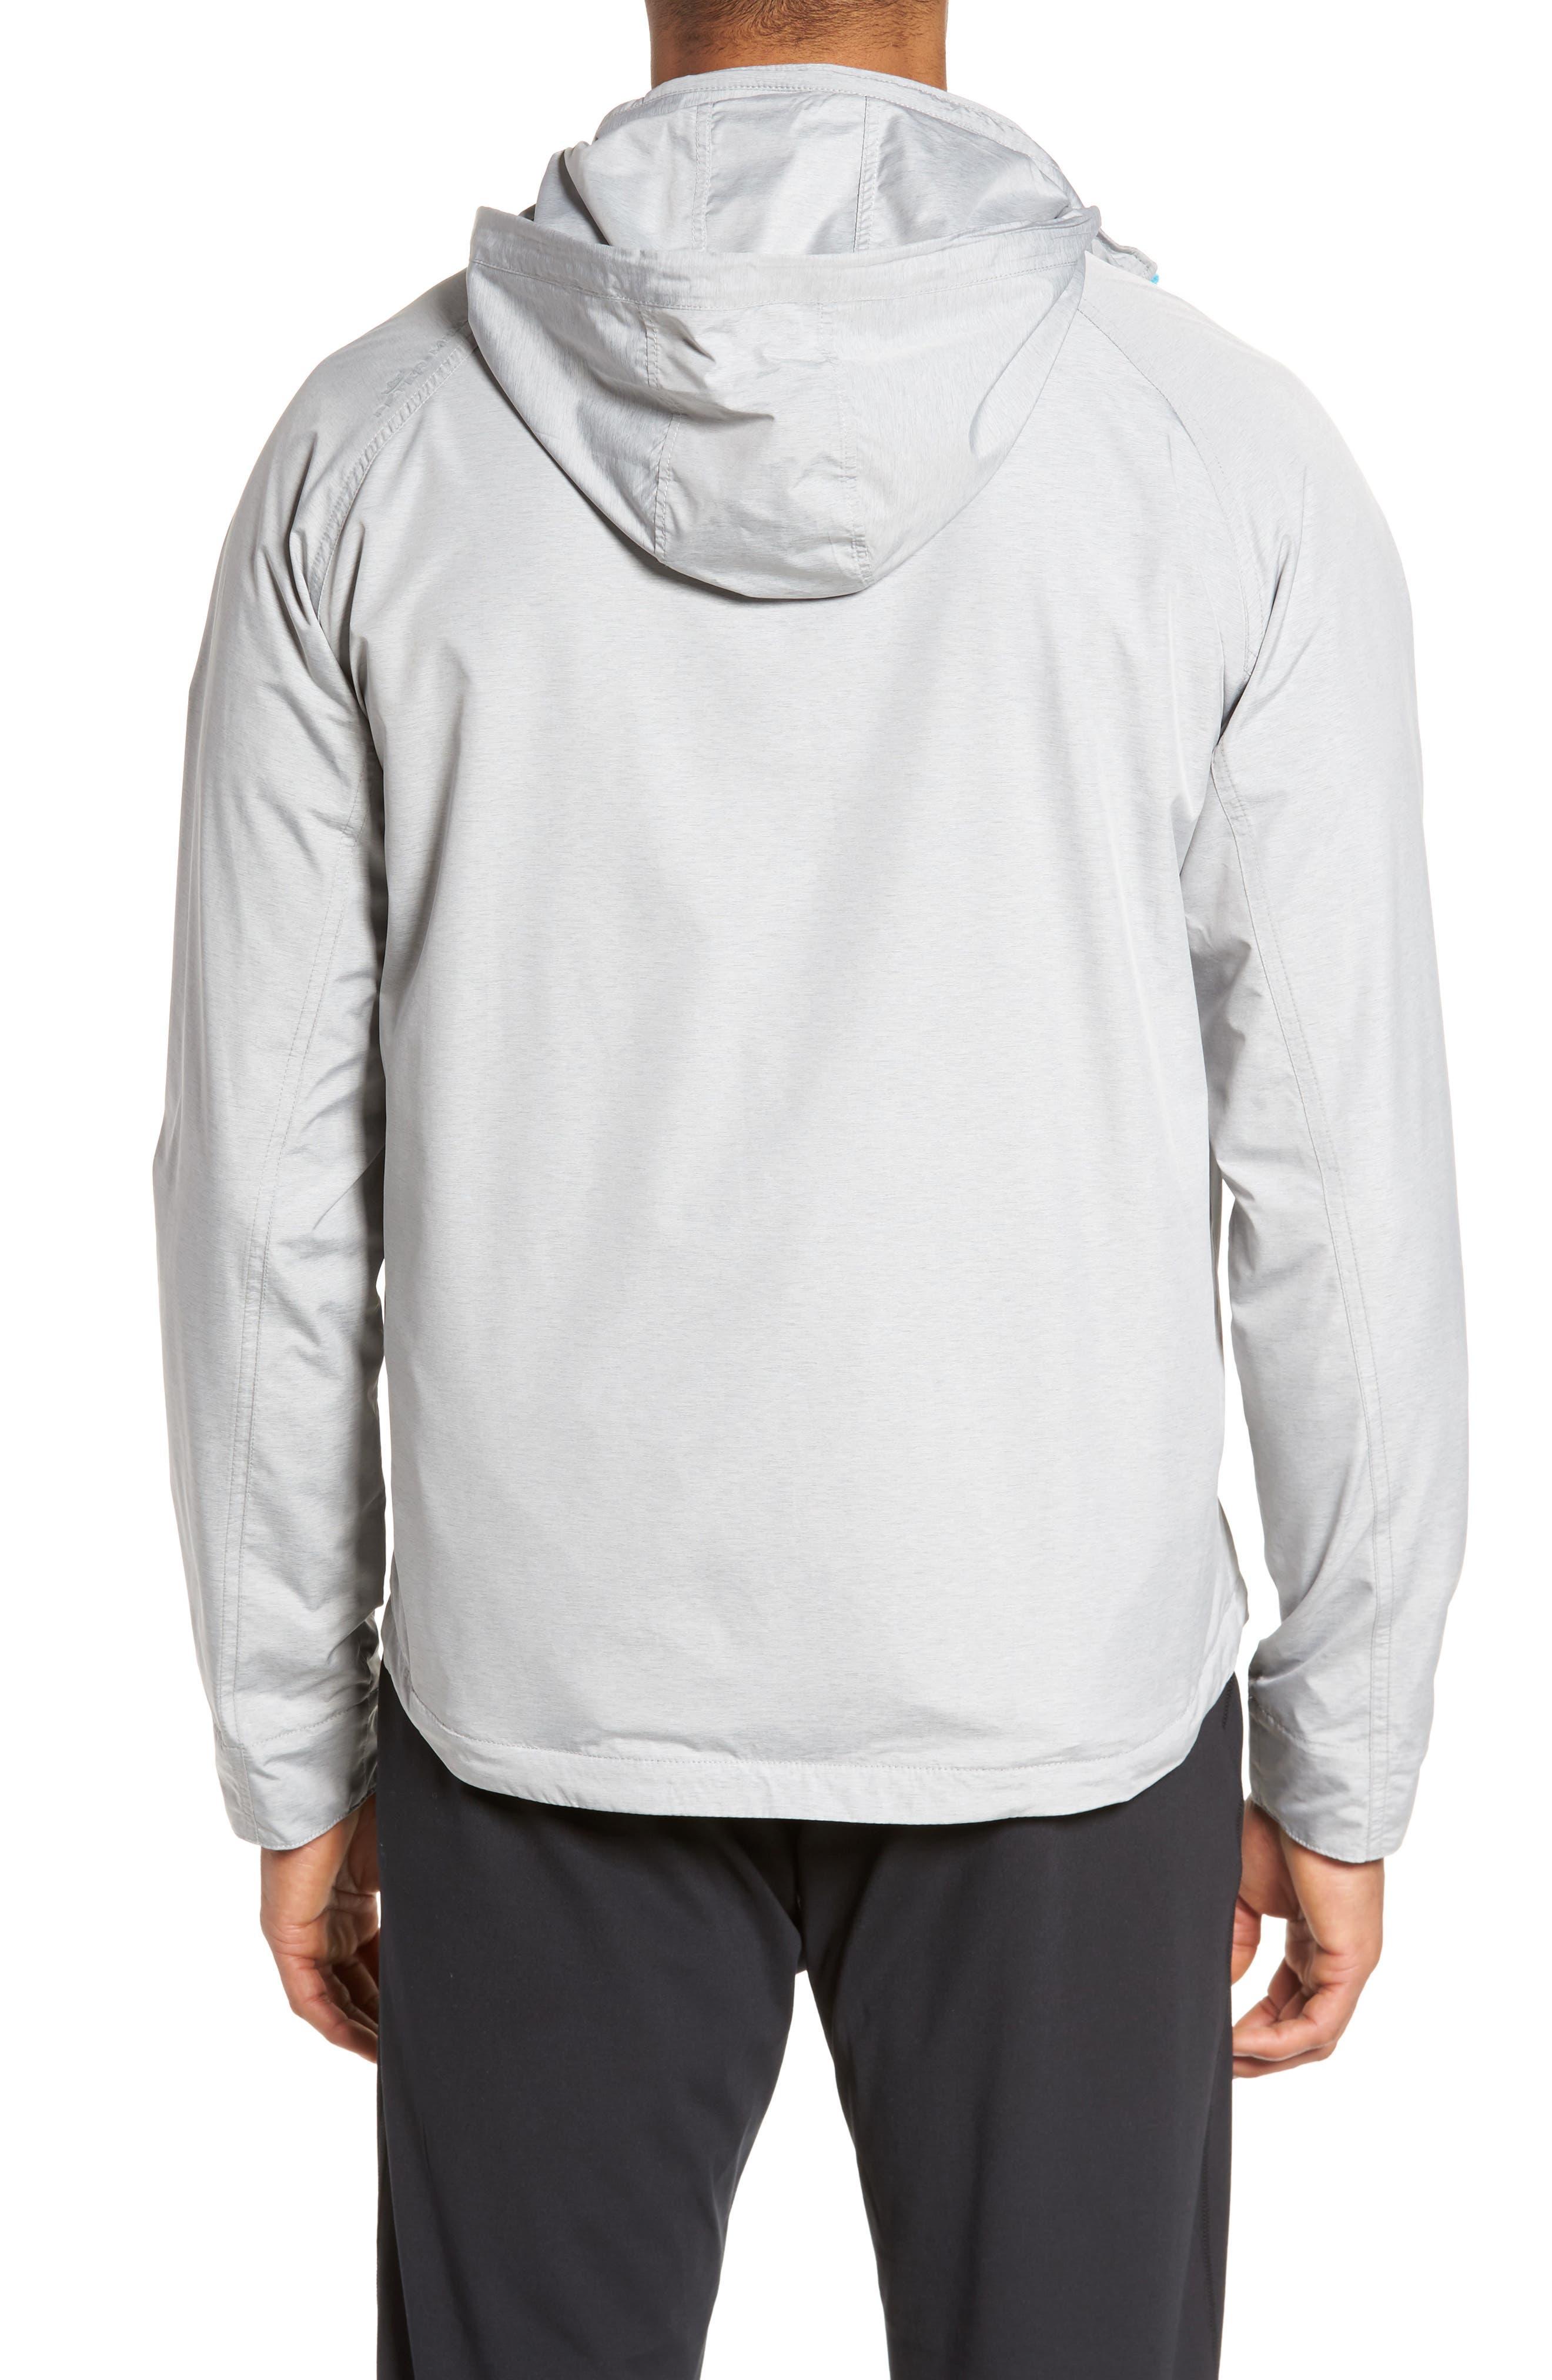 Nagano Windbreaker Jacket,                             Alternate thumbnail 2, color,                             British Grey